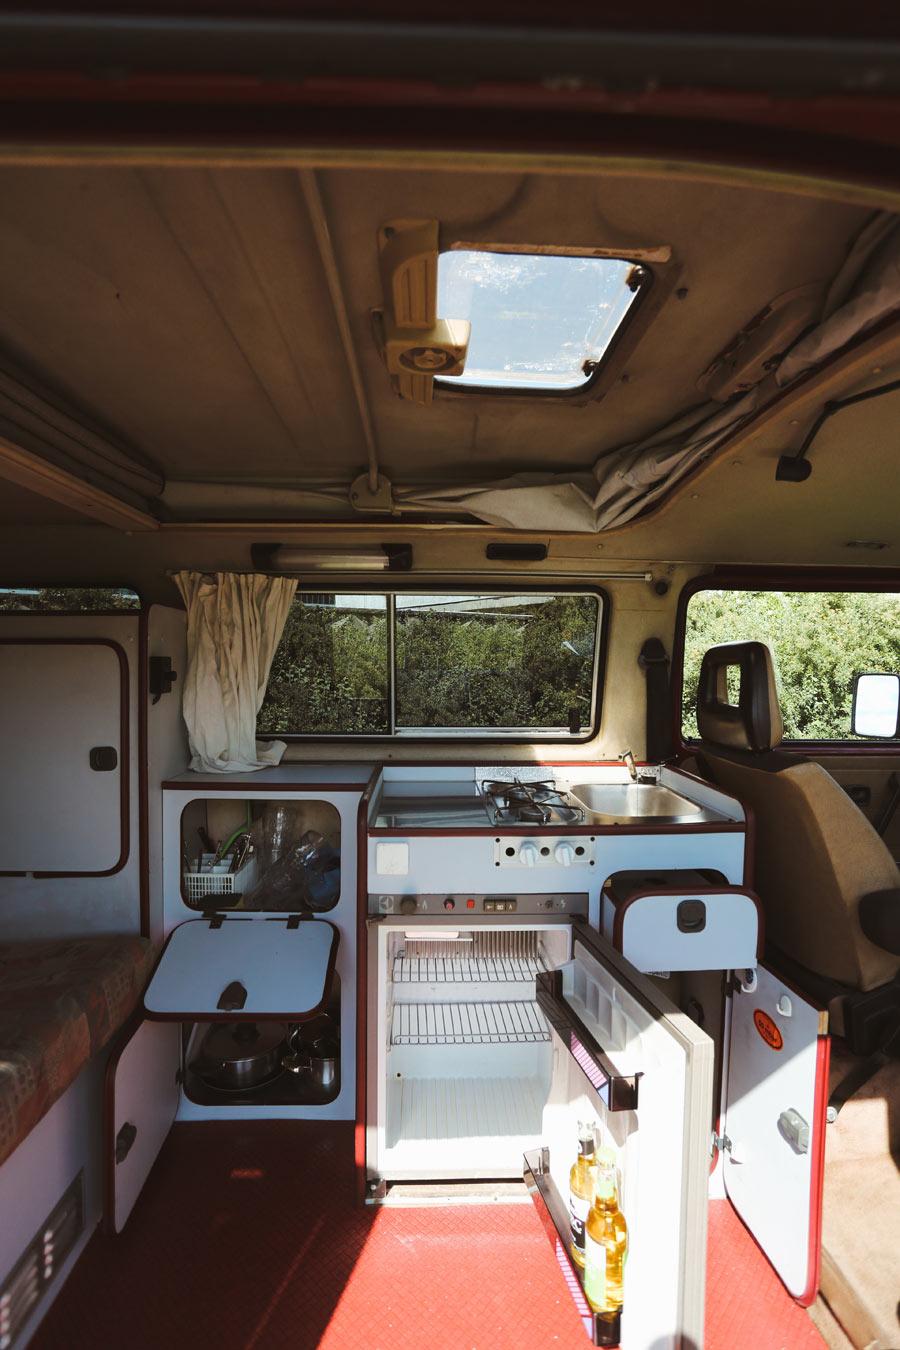 BulliHoliday Campingbus mieten Janine - Wohnmraum und Küche